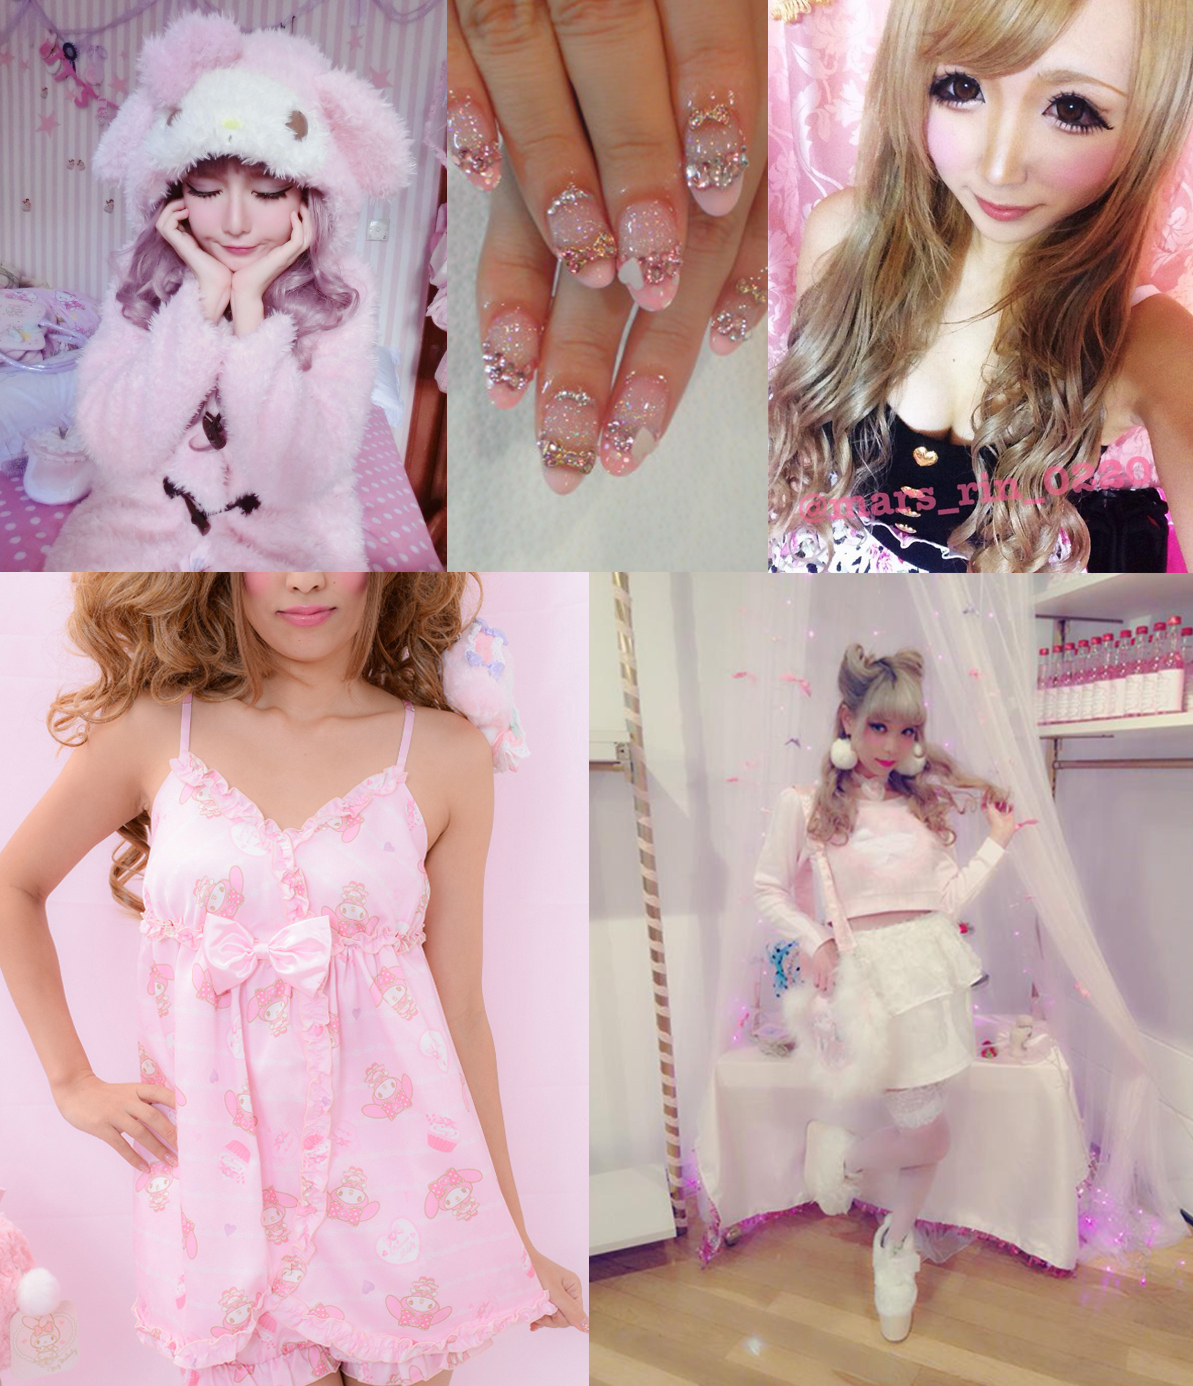 gyaru styles collage